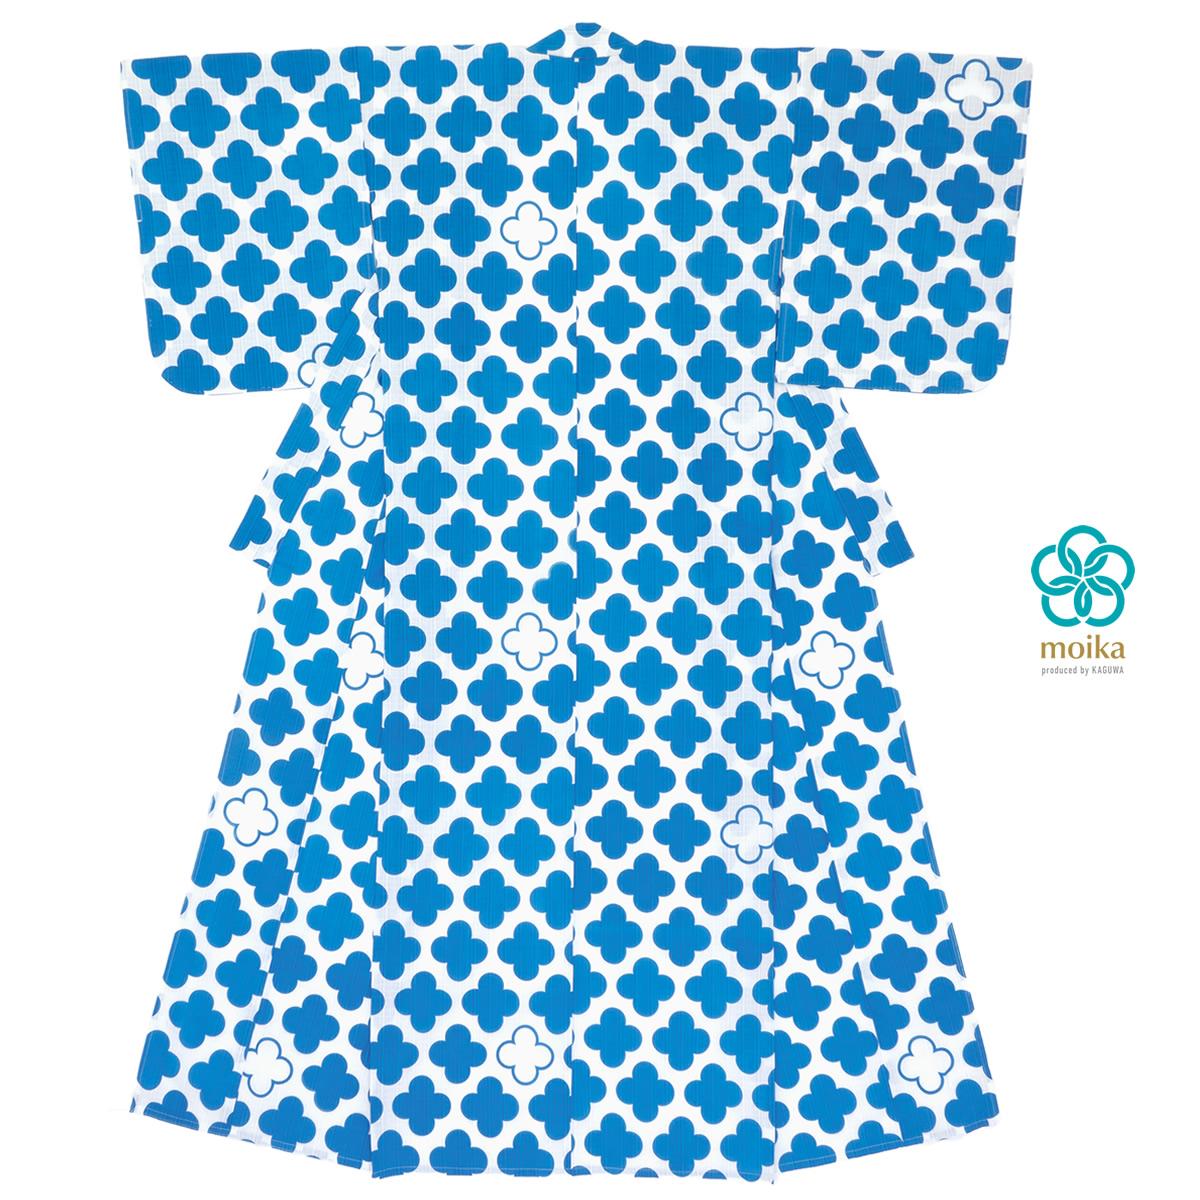 moika 浴衣 レディース 単品 Mサイズ レトロ 青 ブルー 四つ葉 小紋 衿芯付き 女性用 仕立て上がり